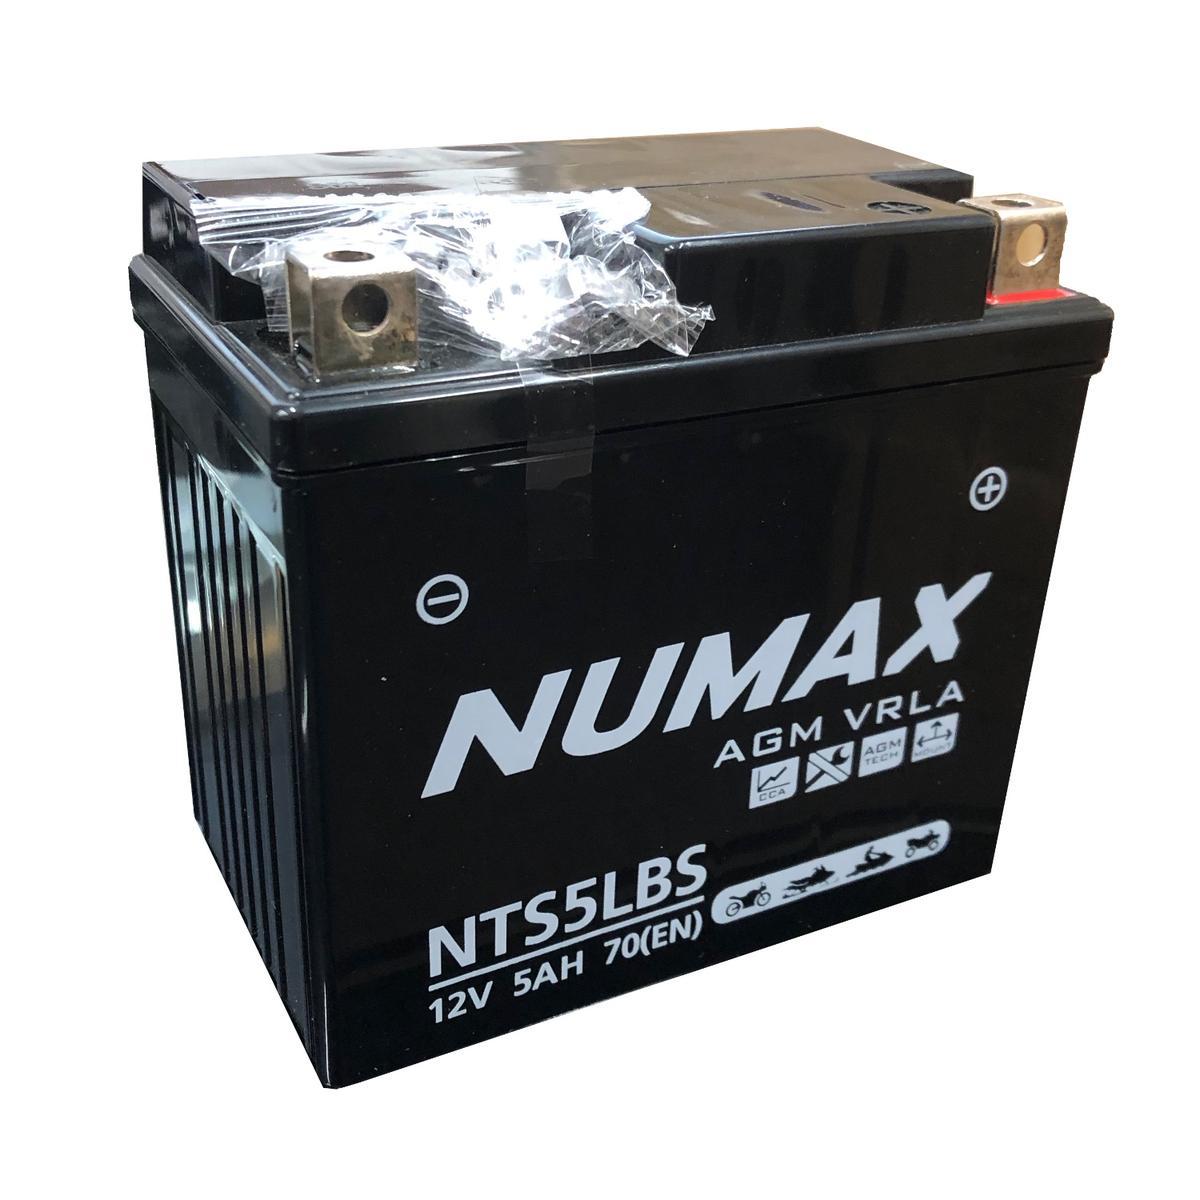 Numax 12v NTS5LBS Motorbike Bike Battery KYMCO 50cc Cross YTX5L-4